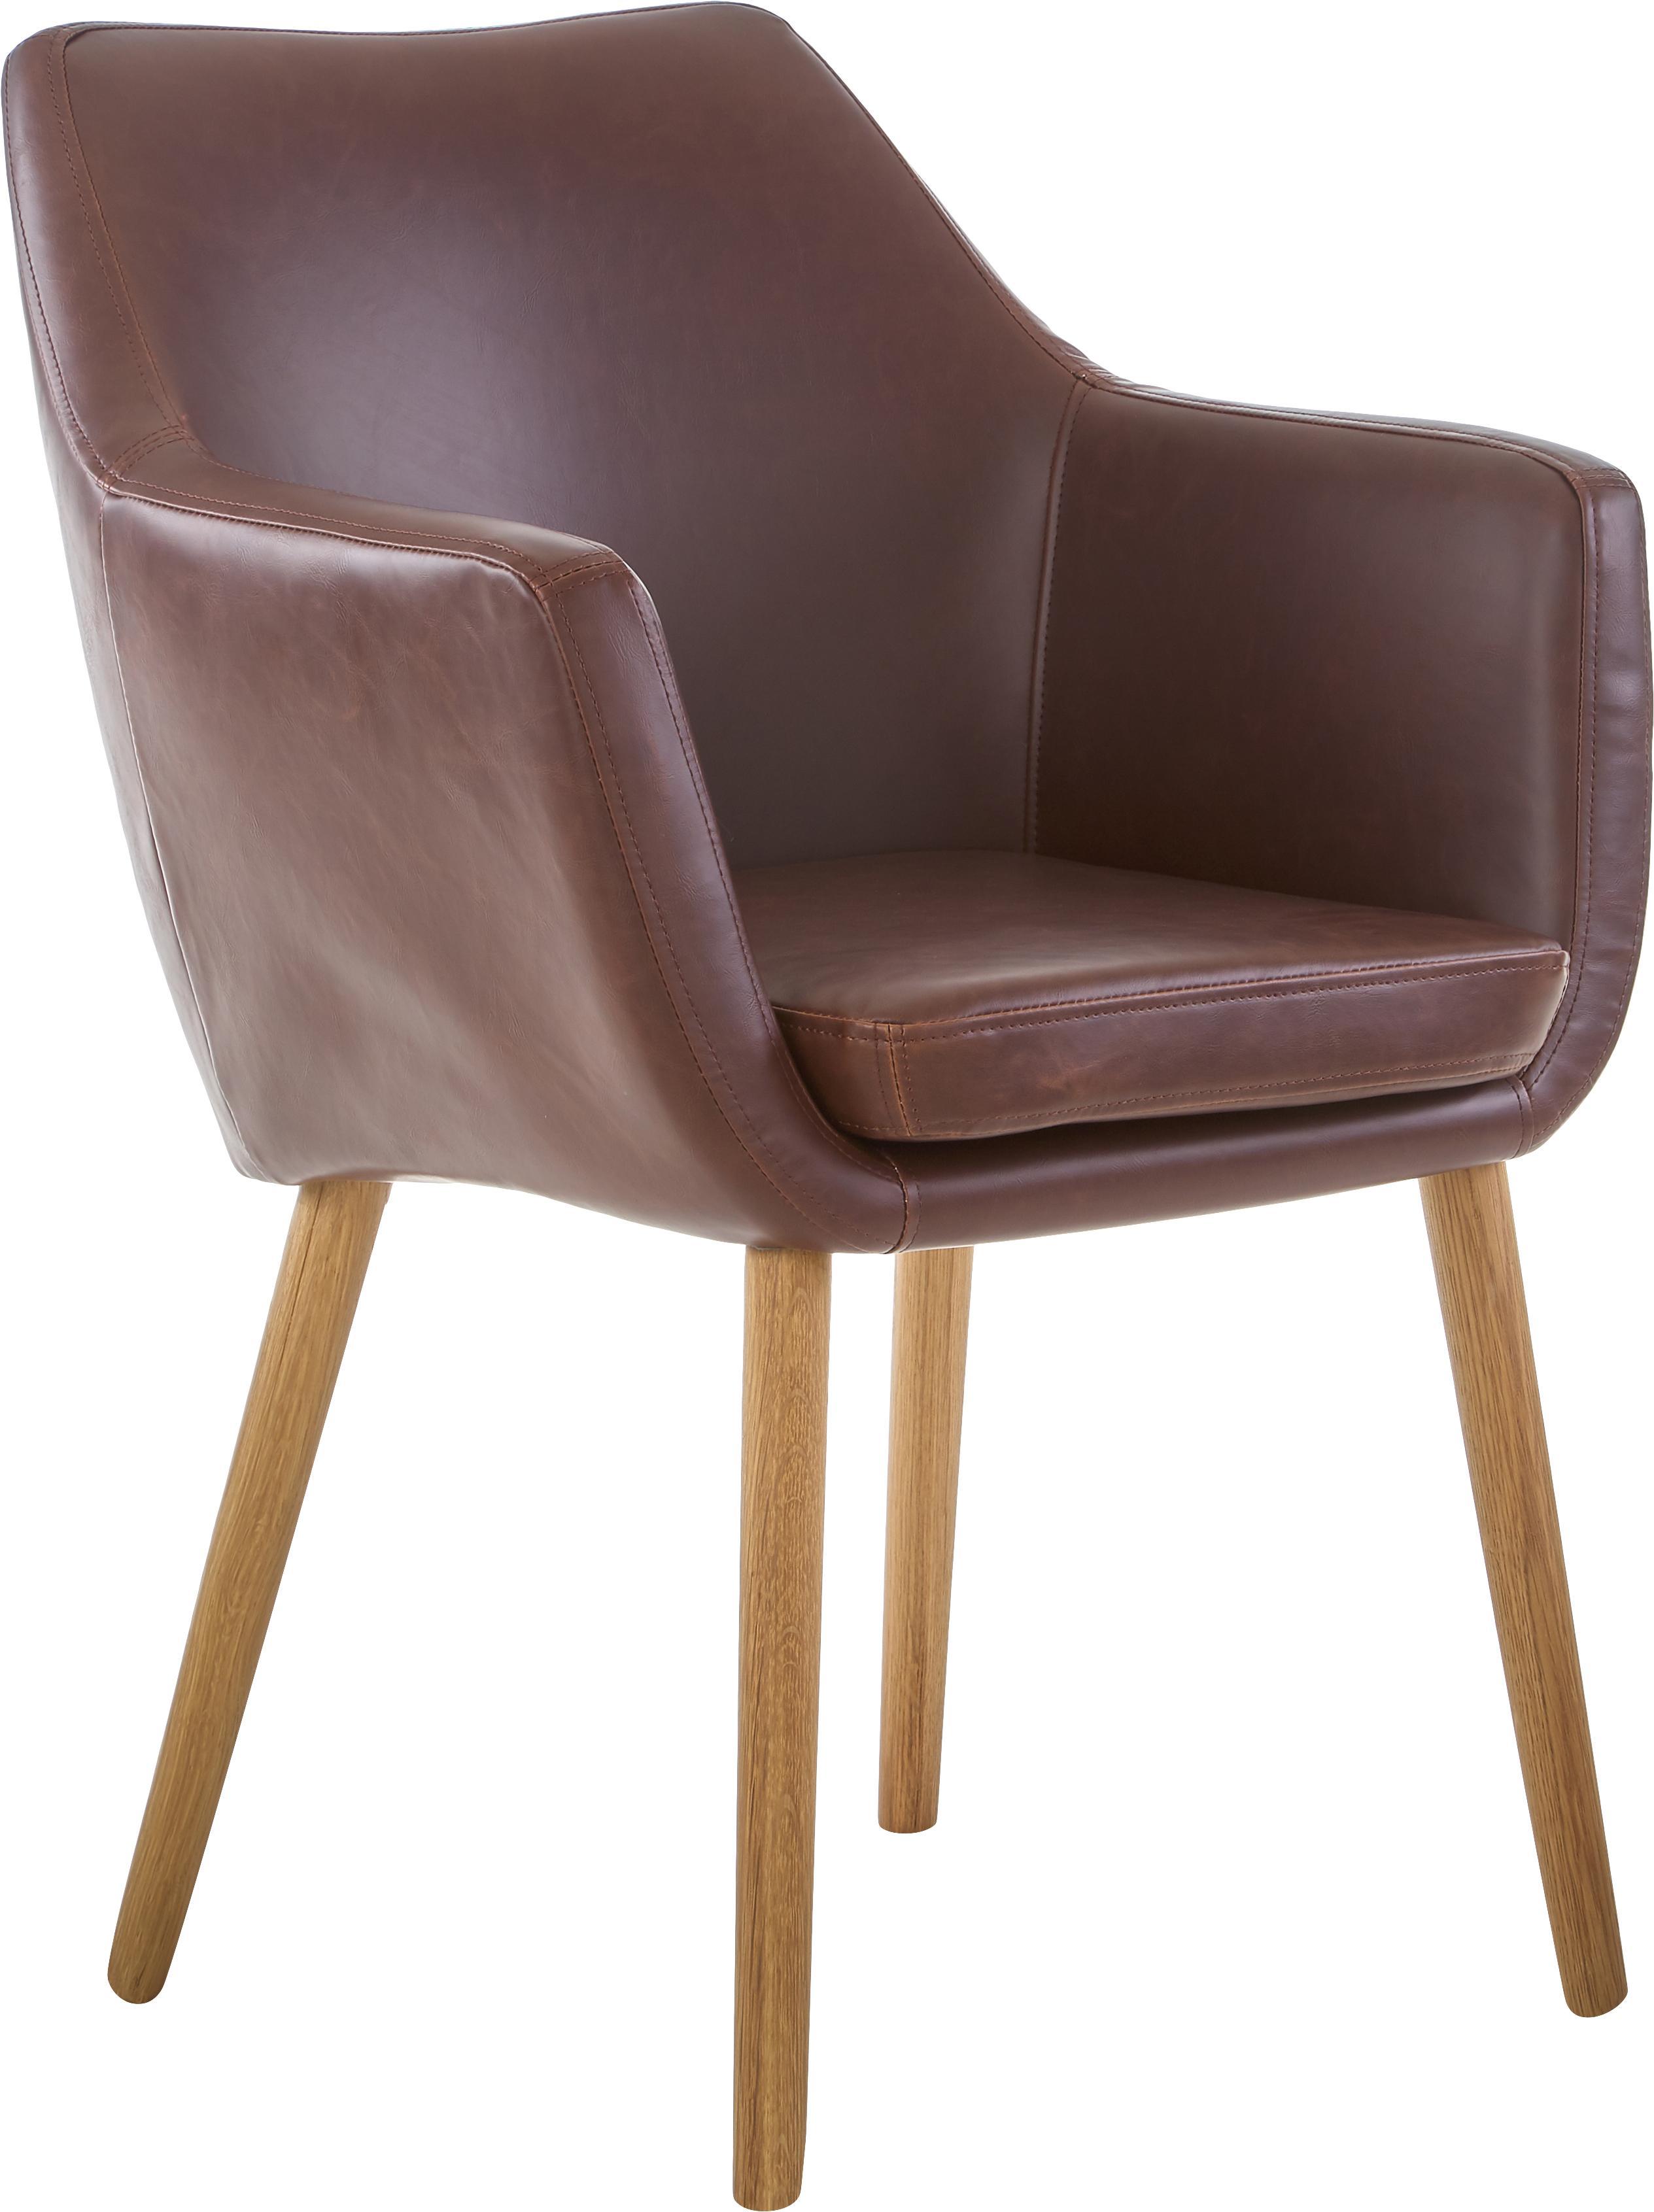 Kunstleren armstoel Nora, Bekleding: imitatieleer (polyurethaa, Poten: eikenhout, Bekleding: chocoladebruin. Frame: eikenhoutkleurig, B 56 x D 55 cm